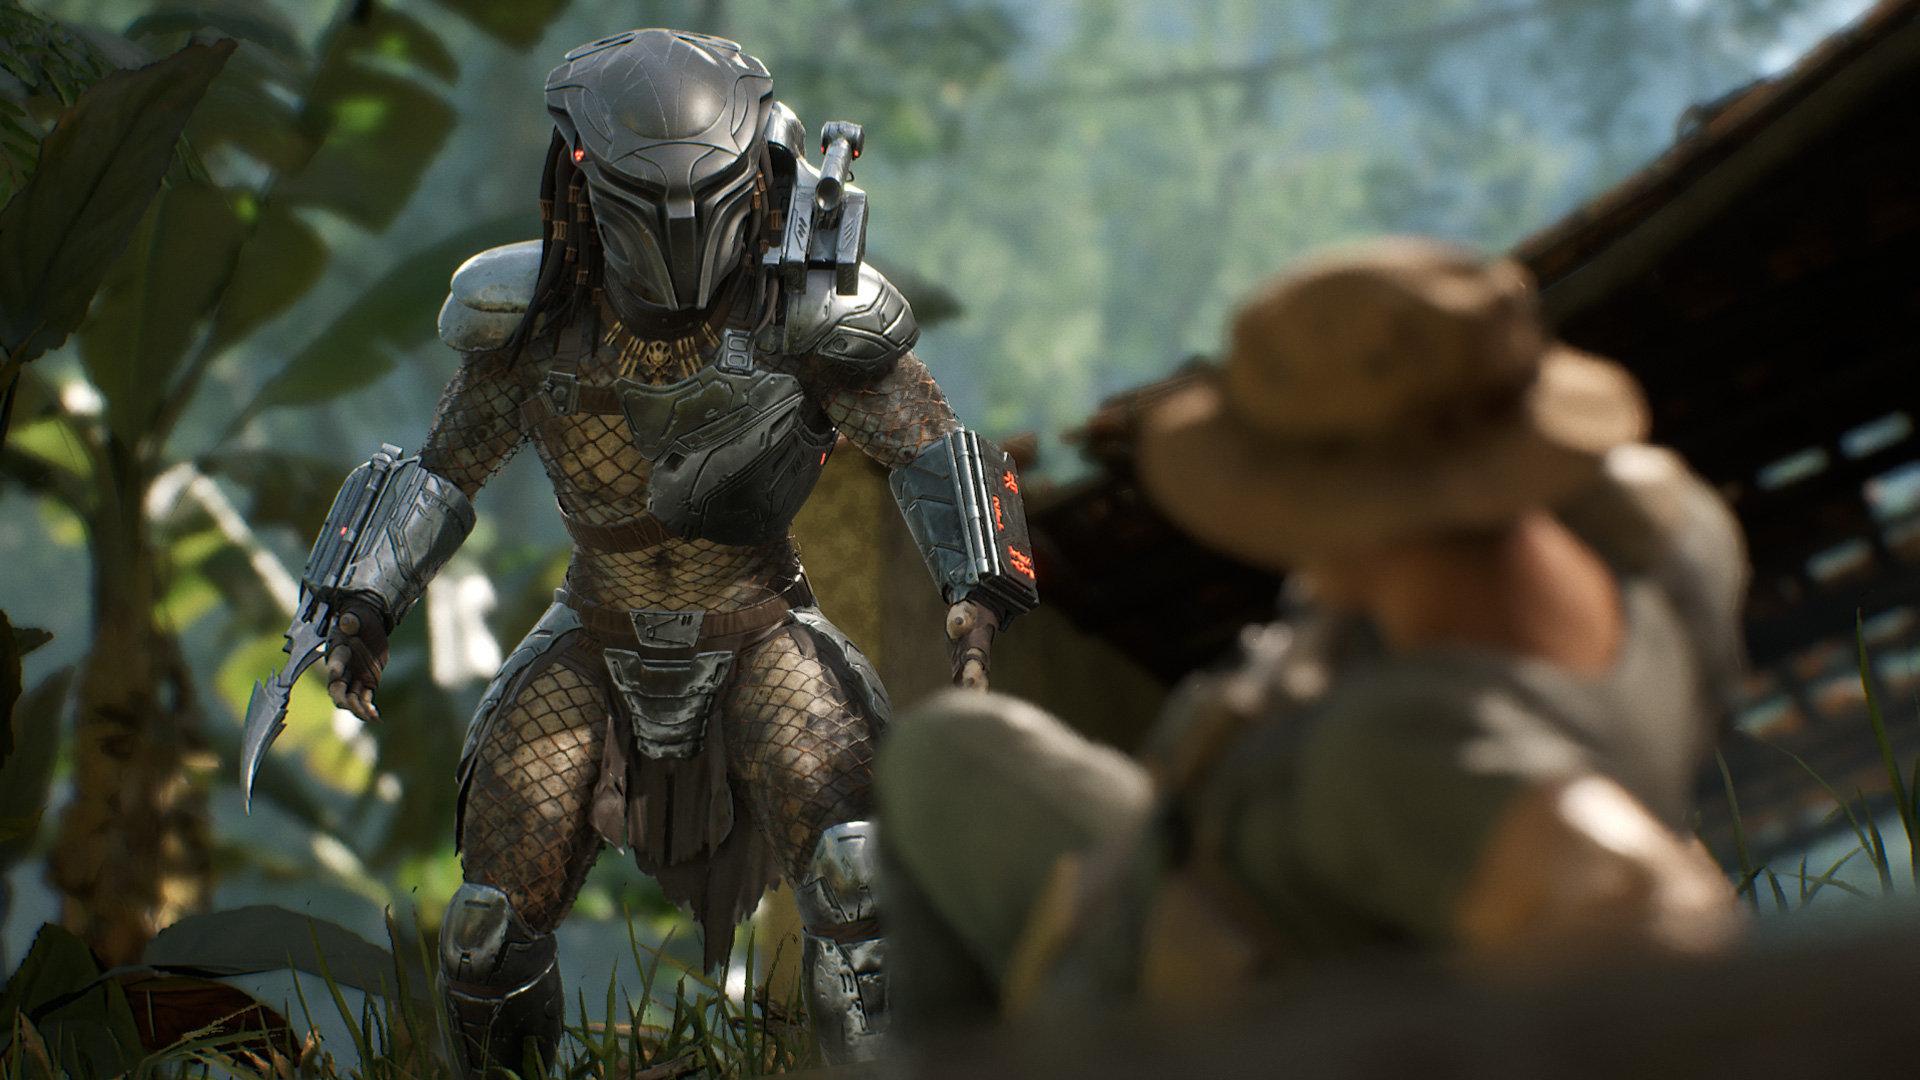 predator hunting grounds screenshot 01 ps4 en 09dec19 1575901432854